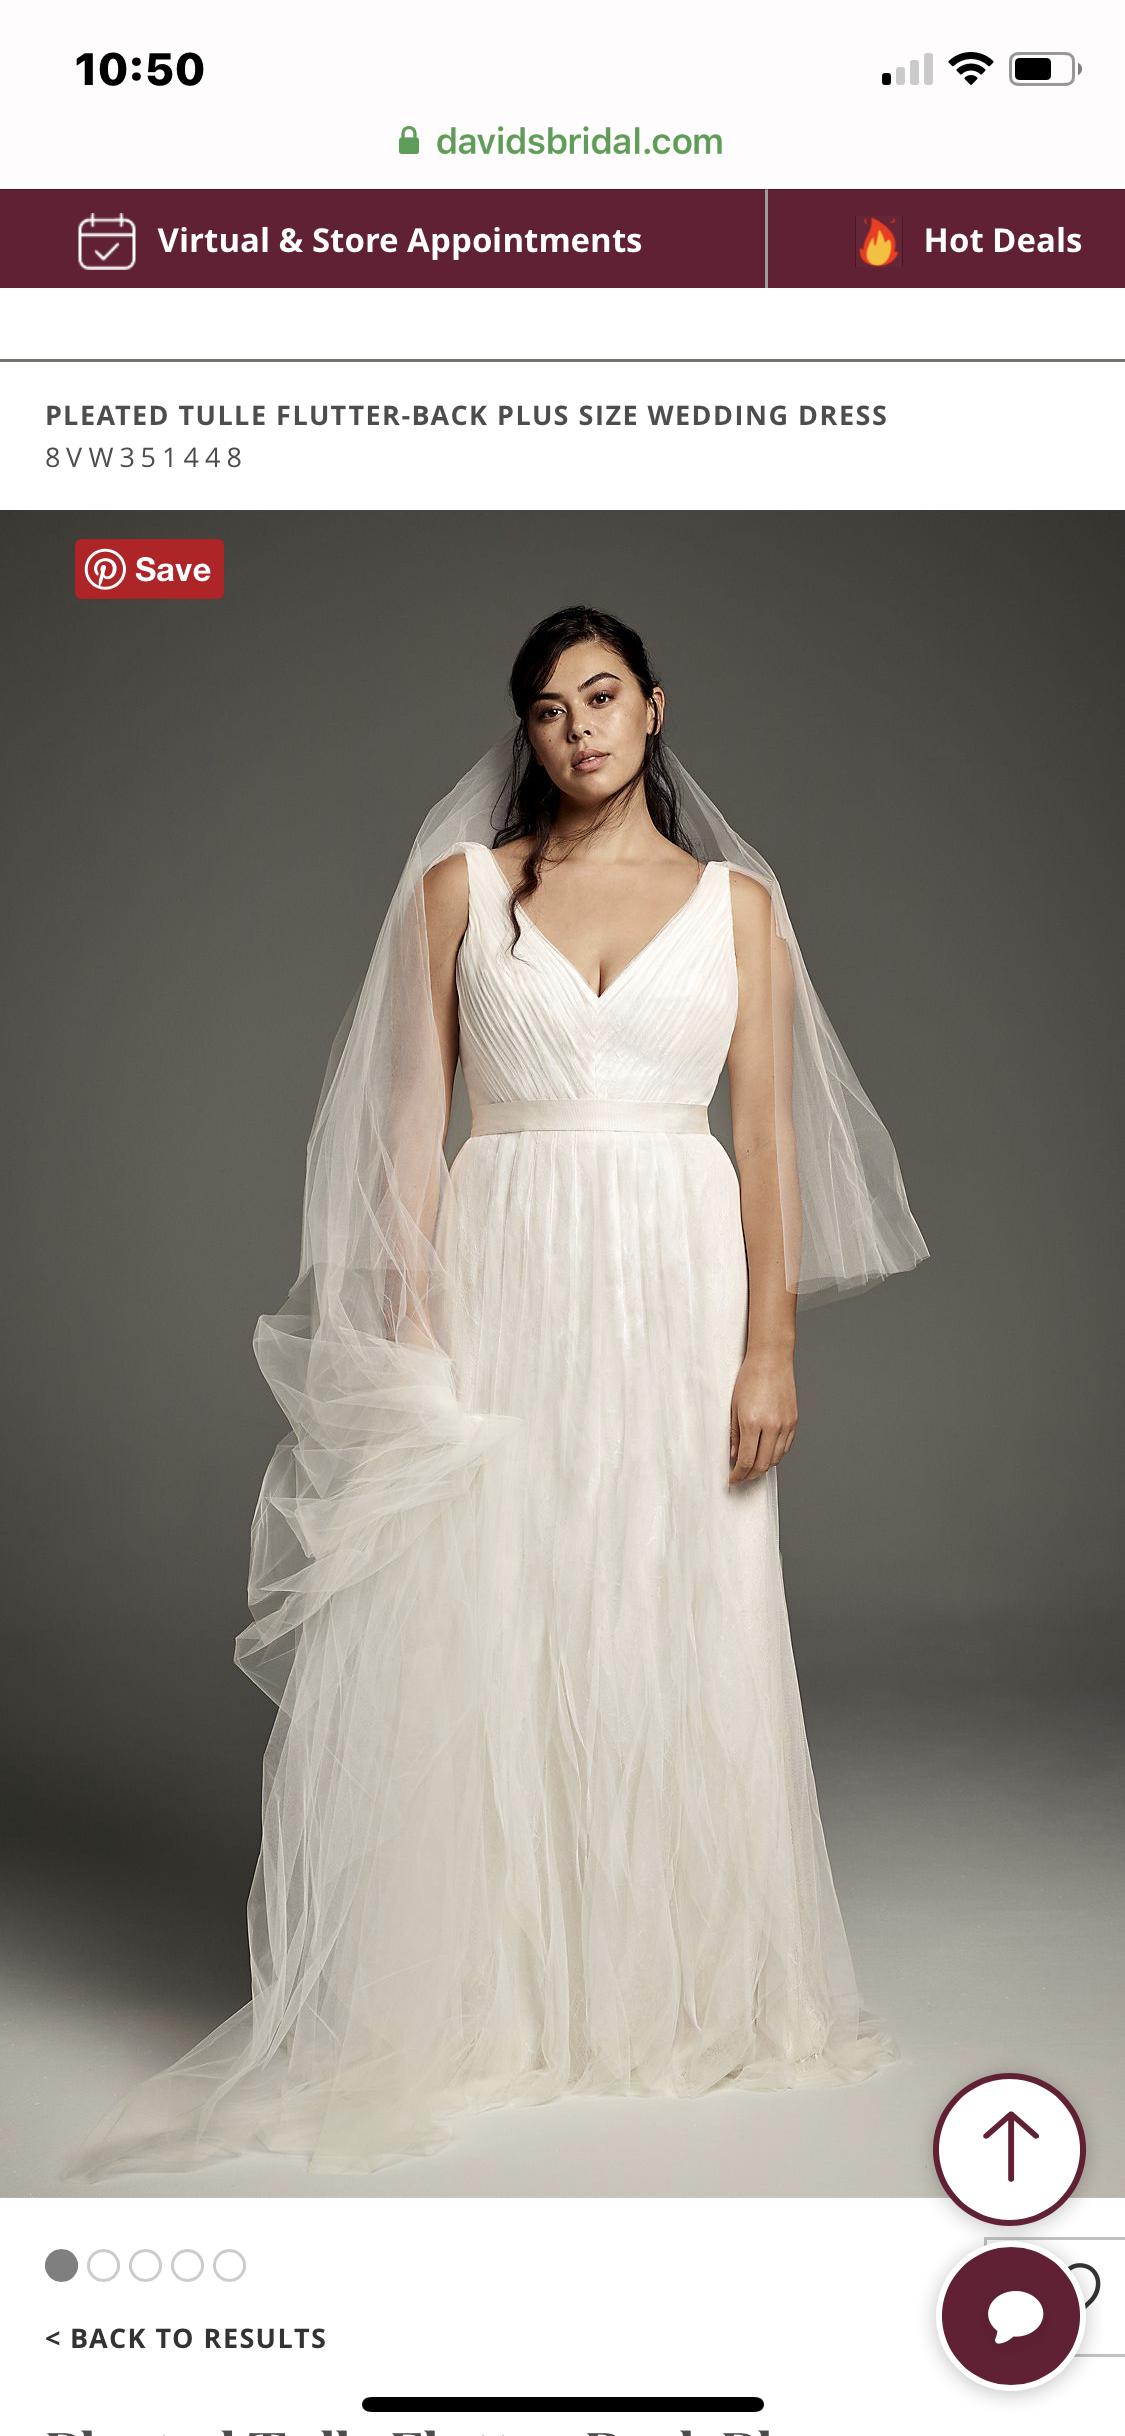 Pin By Lauren Baker On My Wedding 2022 Paul Lauren Tulle Wedding Dress Wedding Dresses Vera Wang Wedding Dresses [ 2436 x 1125 Pixel ]